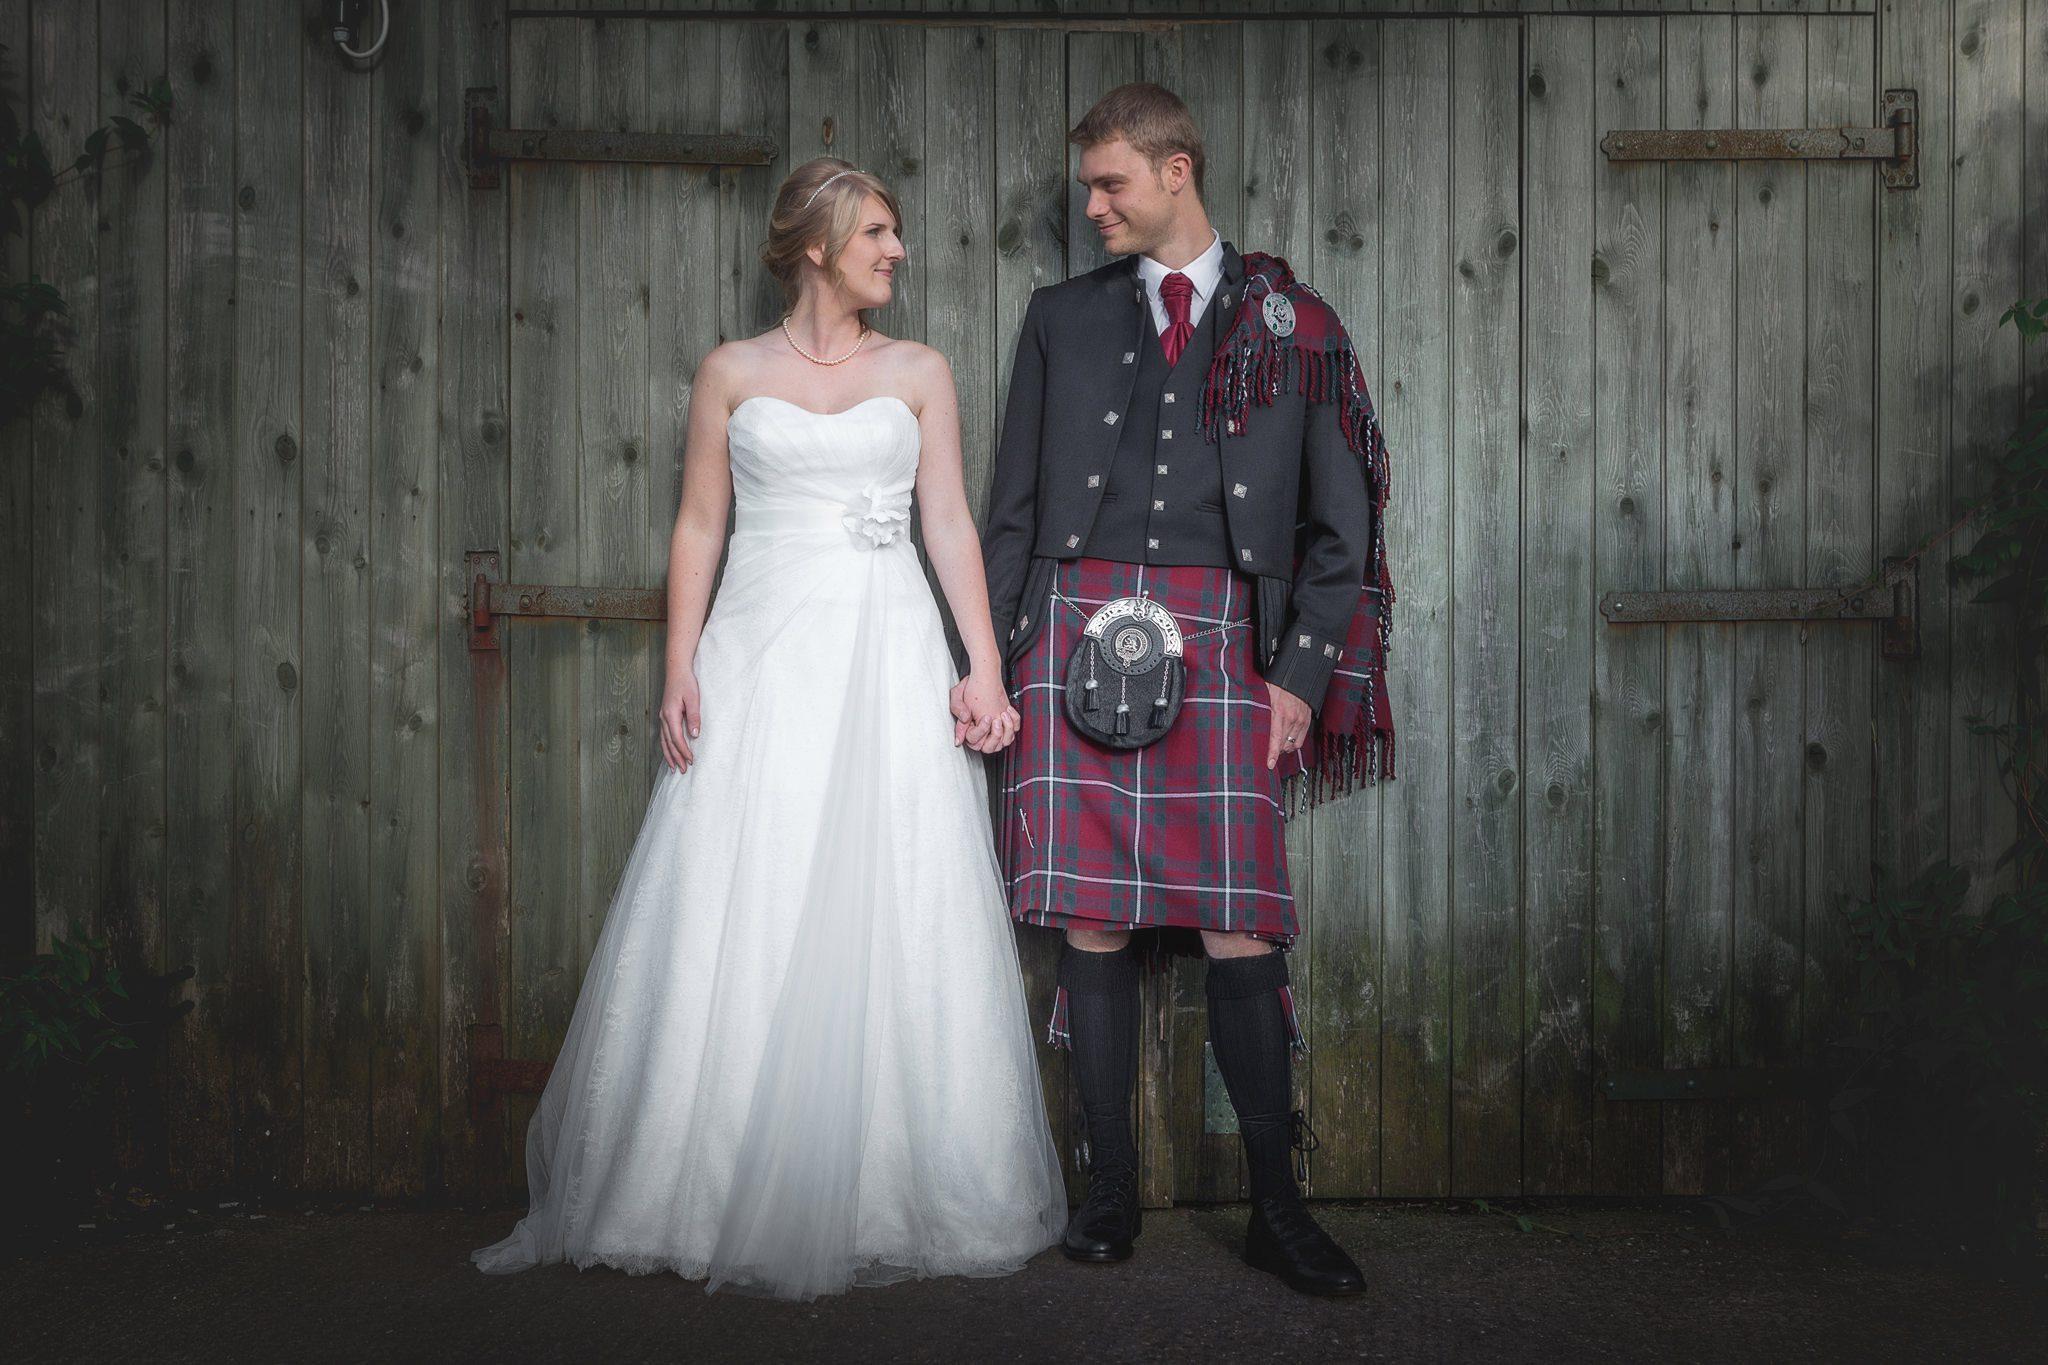 The Three Horseshoes Inn Wedding - Couple Shots